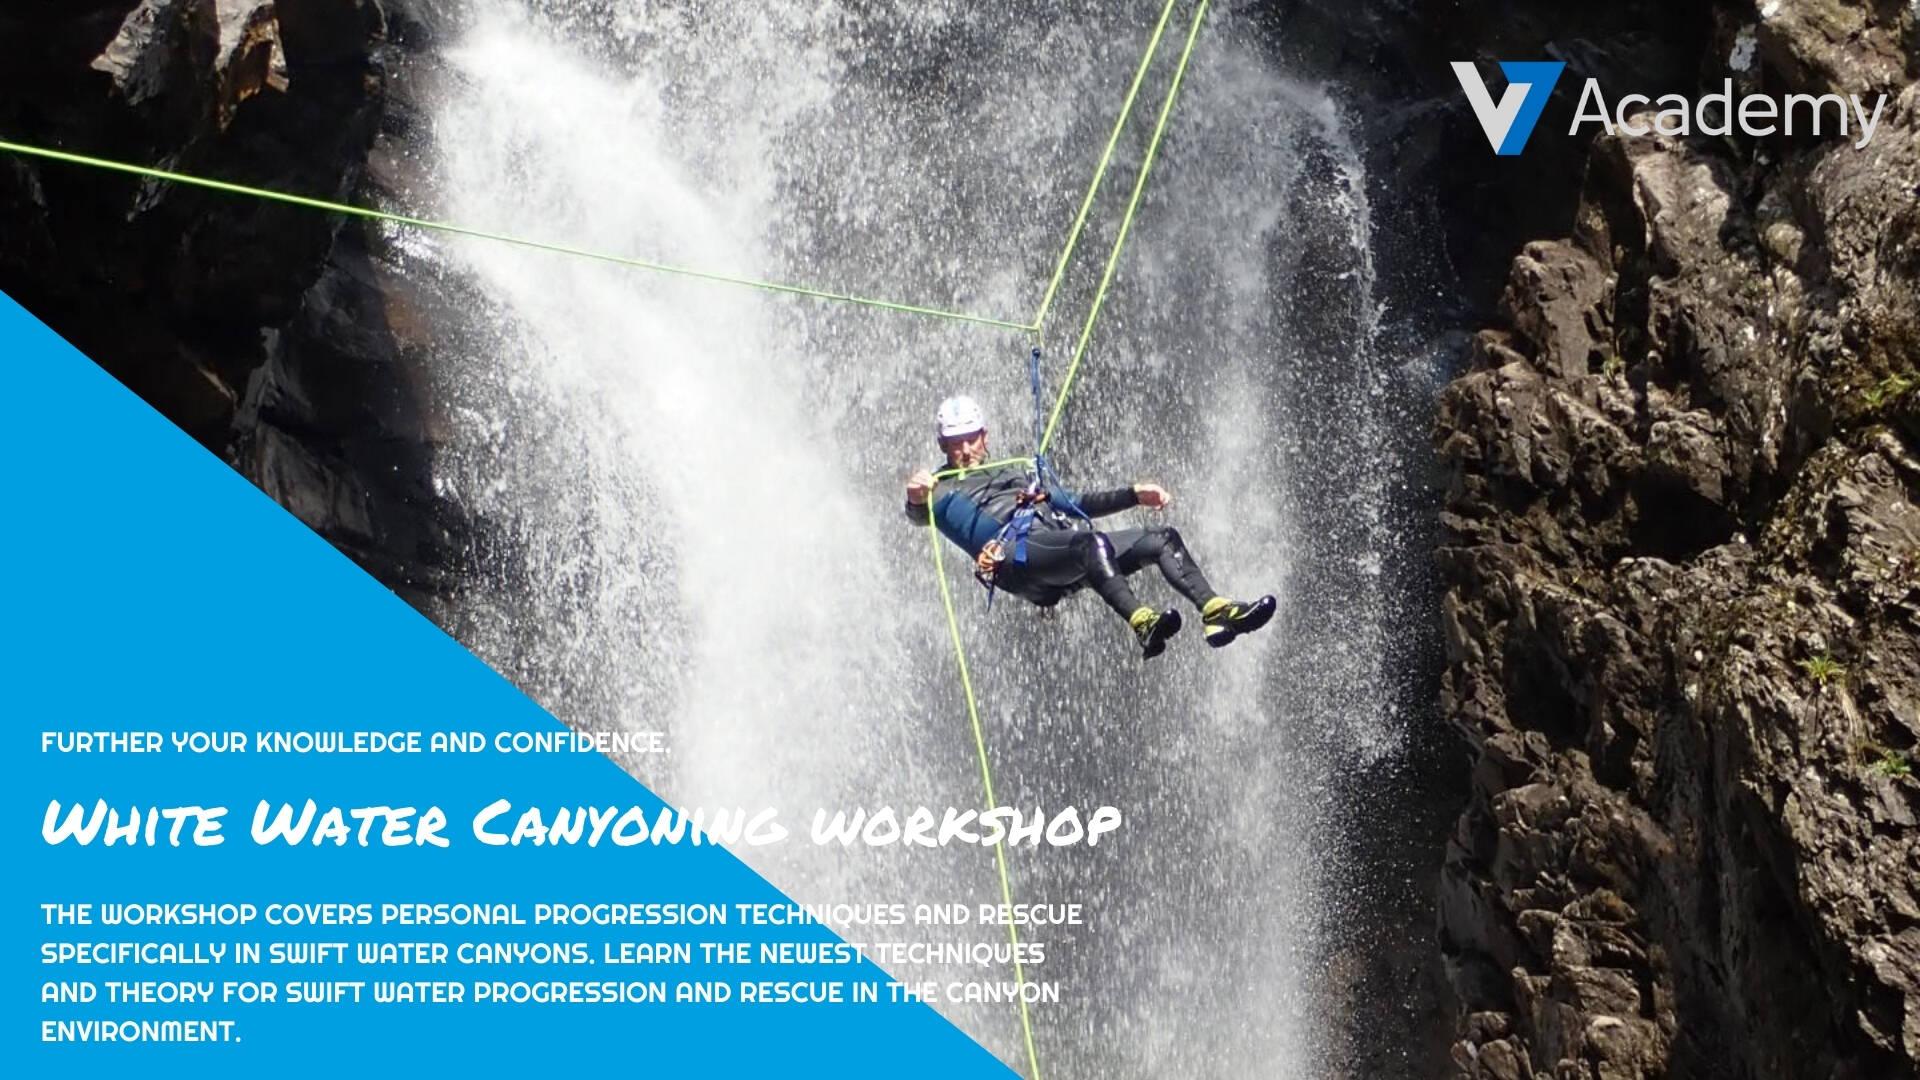 white water canyoning workshop